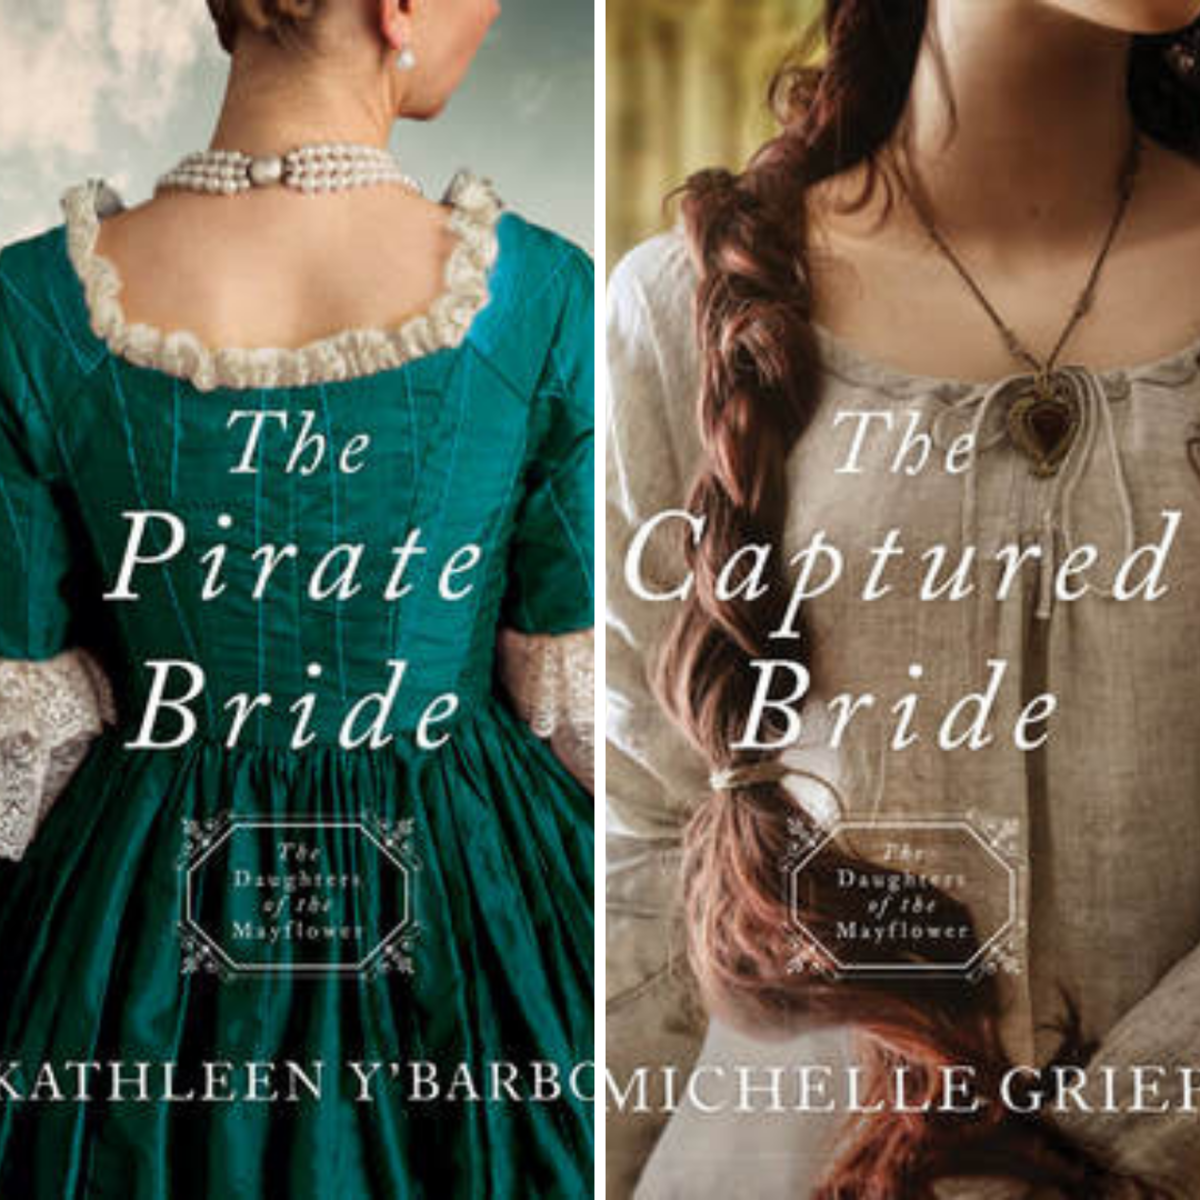 Books 1 & 2 of this wonderful series